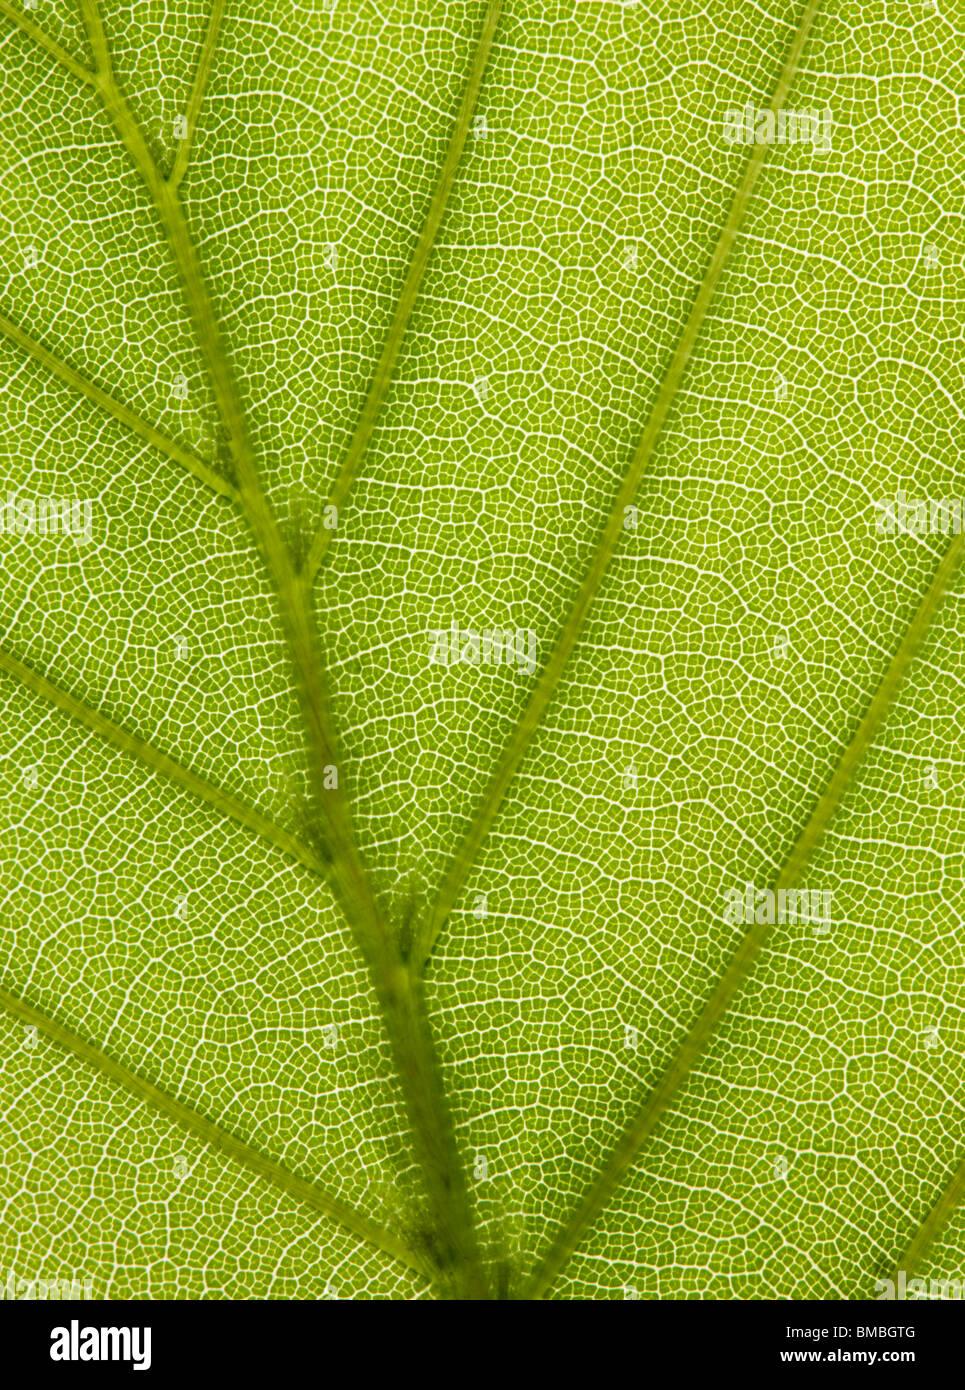 Hojas de hayas, Fagus sylvatica. Retroiluminada para mostrar las venas. Imagen De Stock